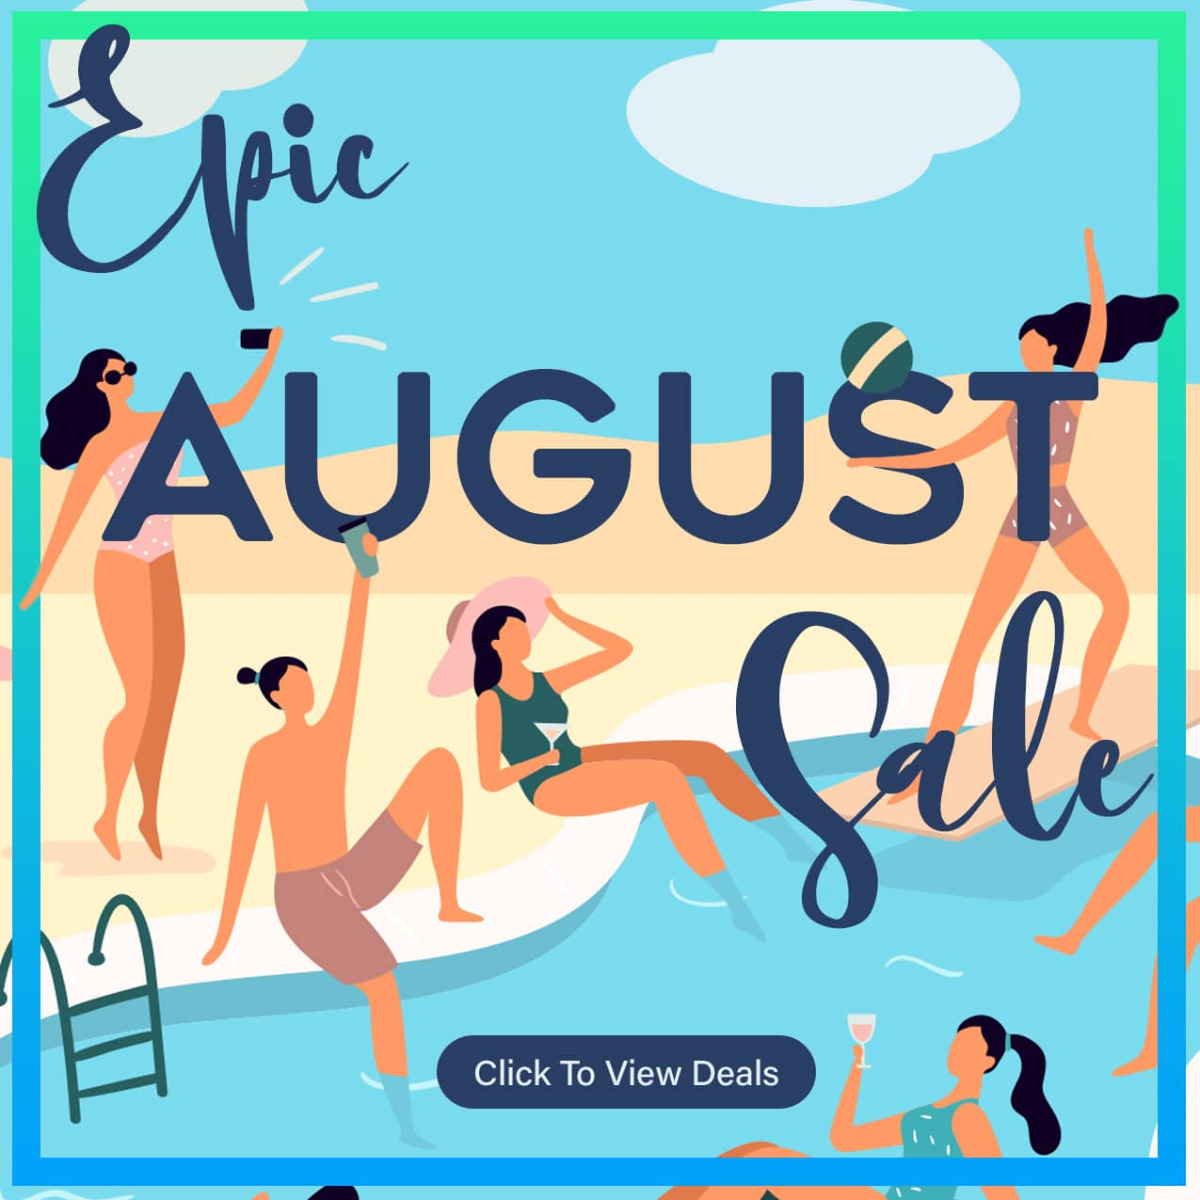 Epic August Sale